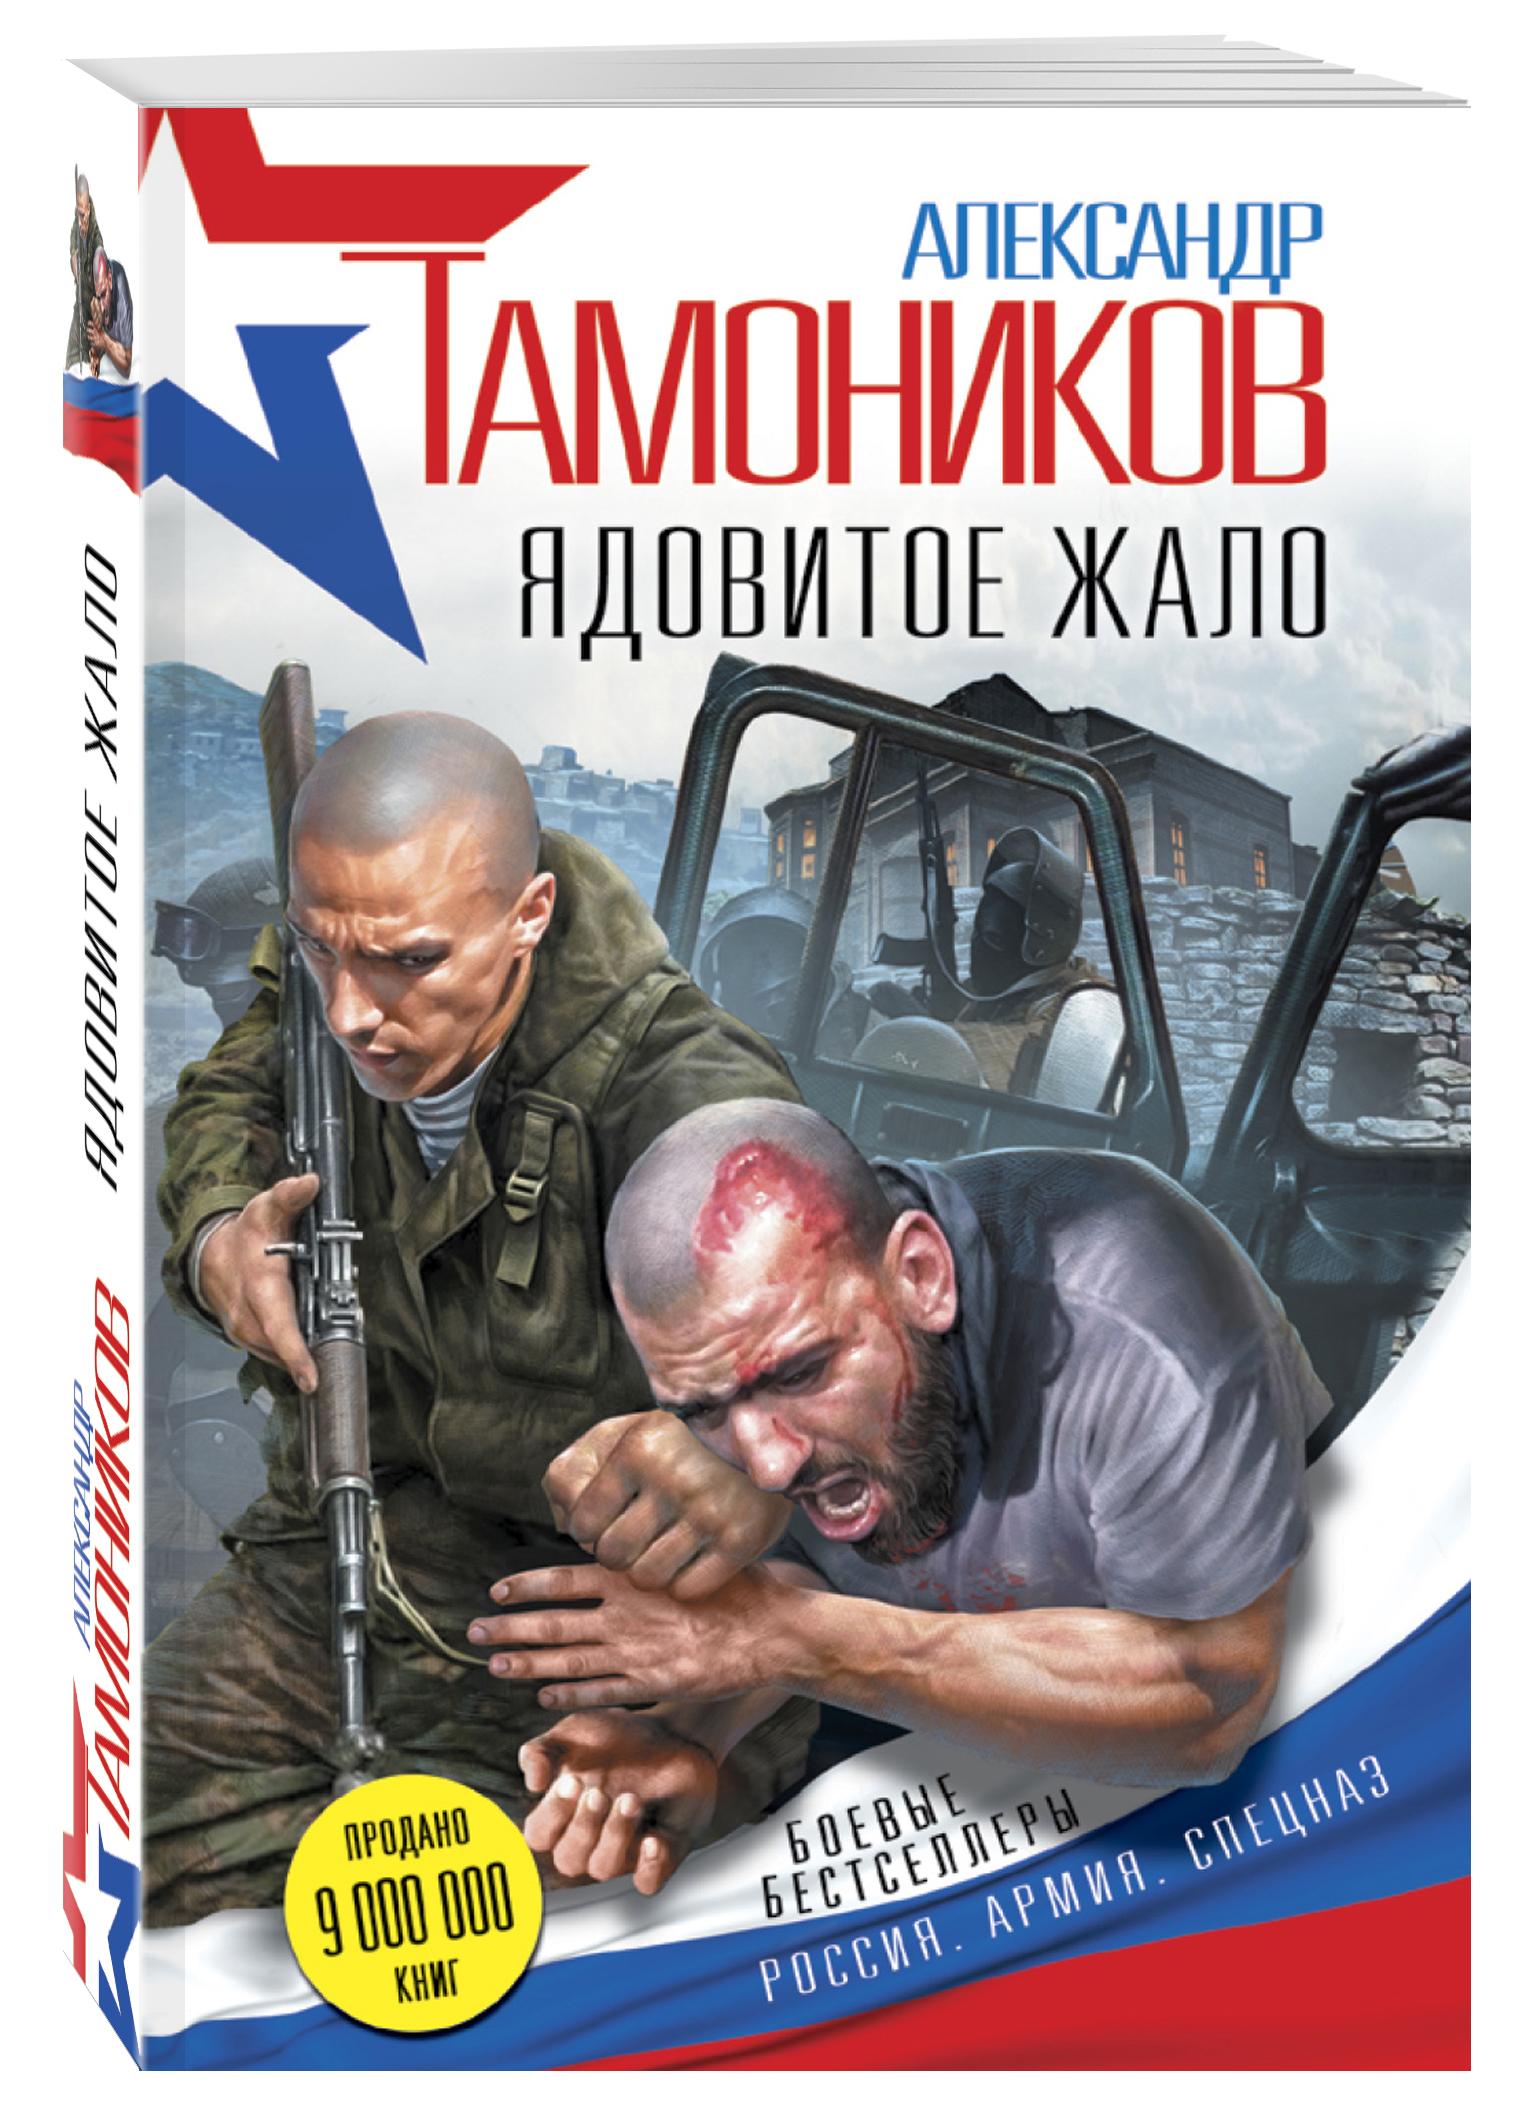 Тамоников А.А. Ядовитое жало александр тамоников ядовитое жало